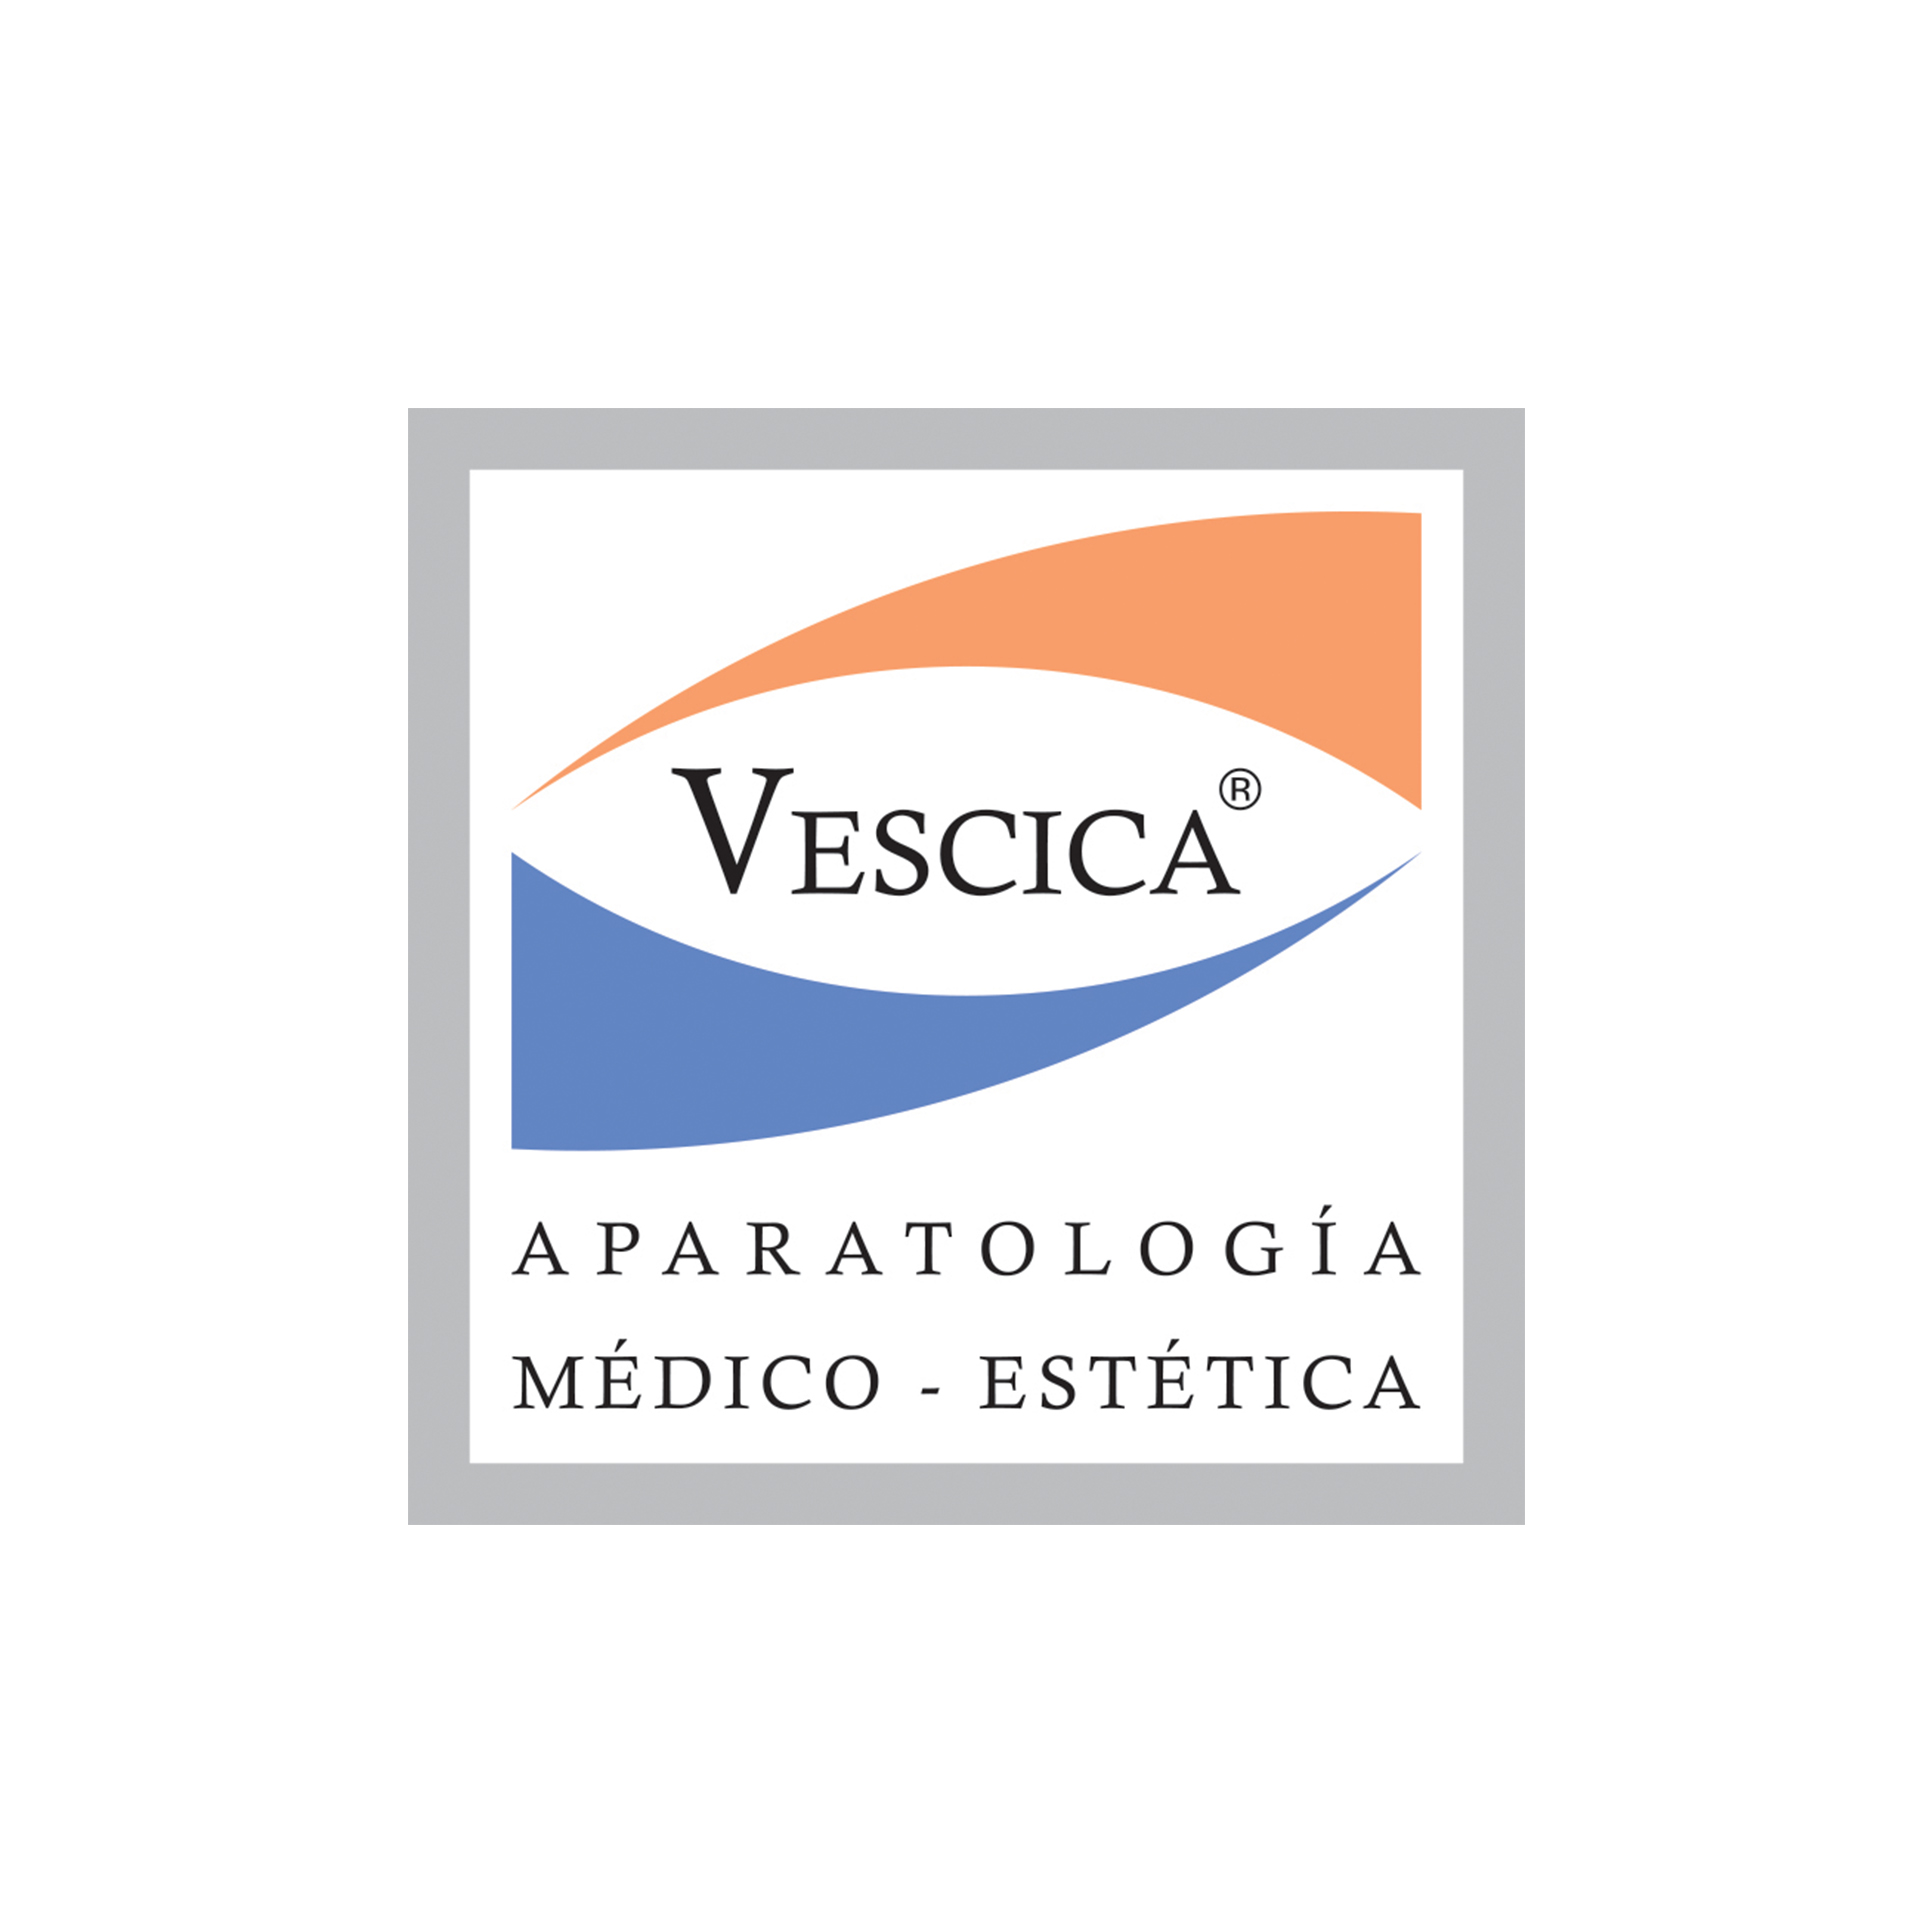 VESCICA